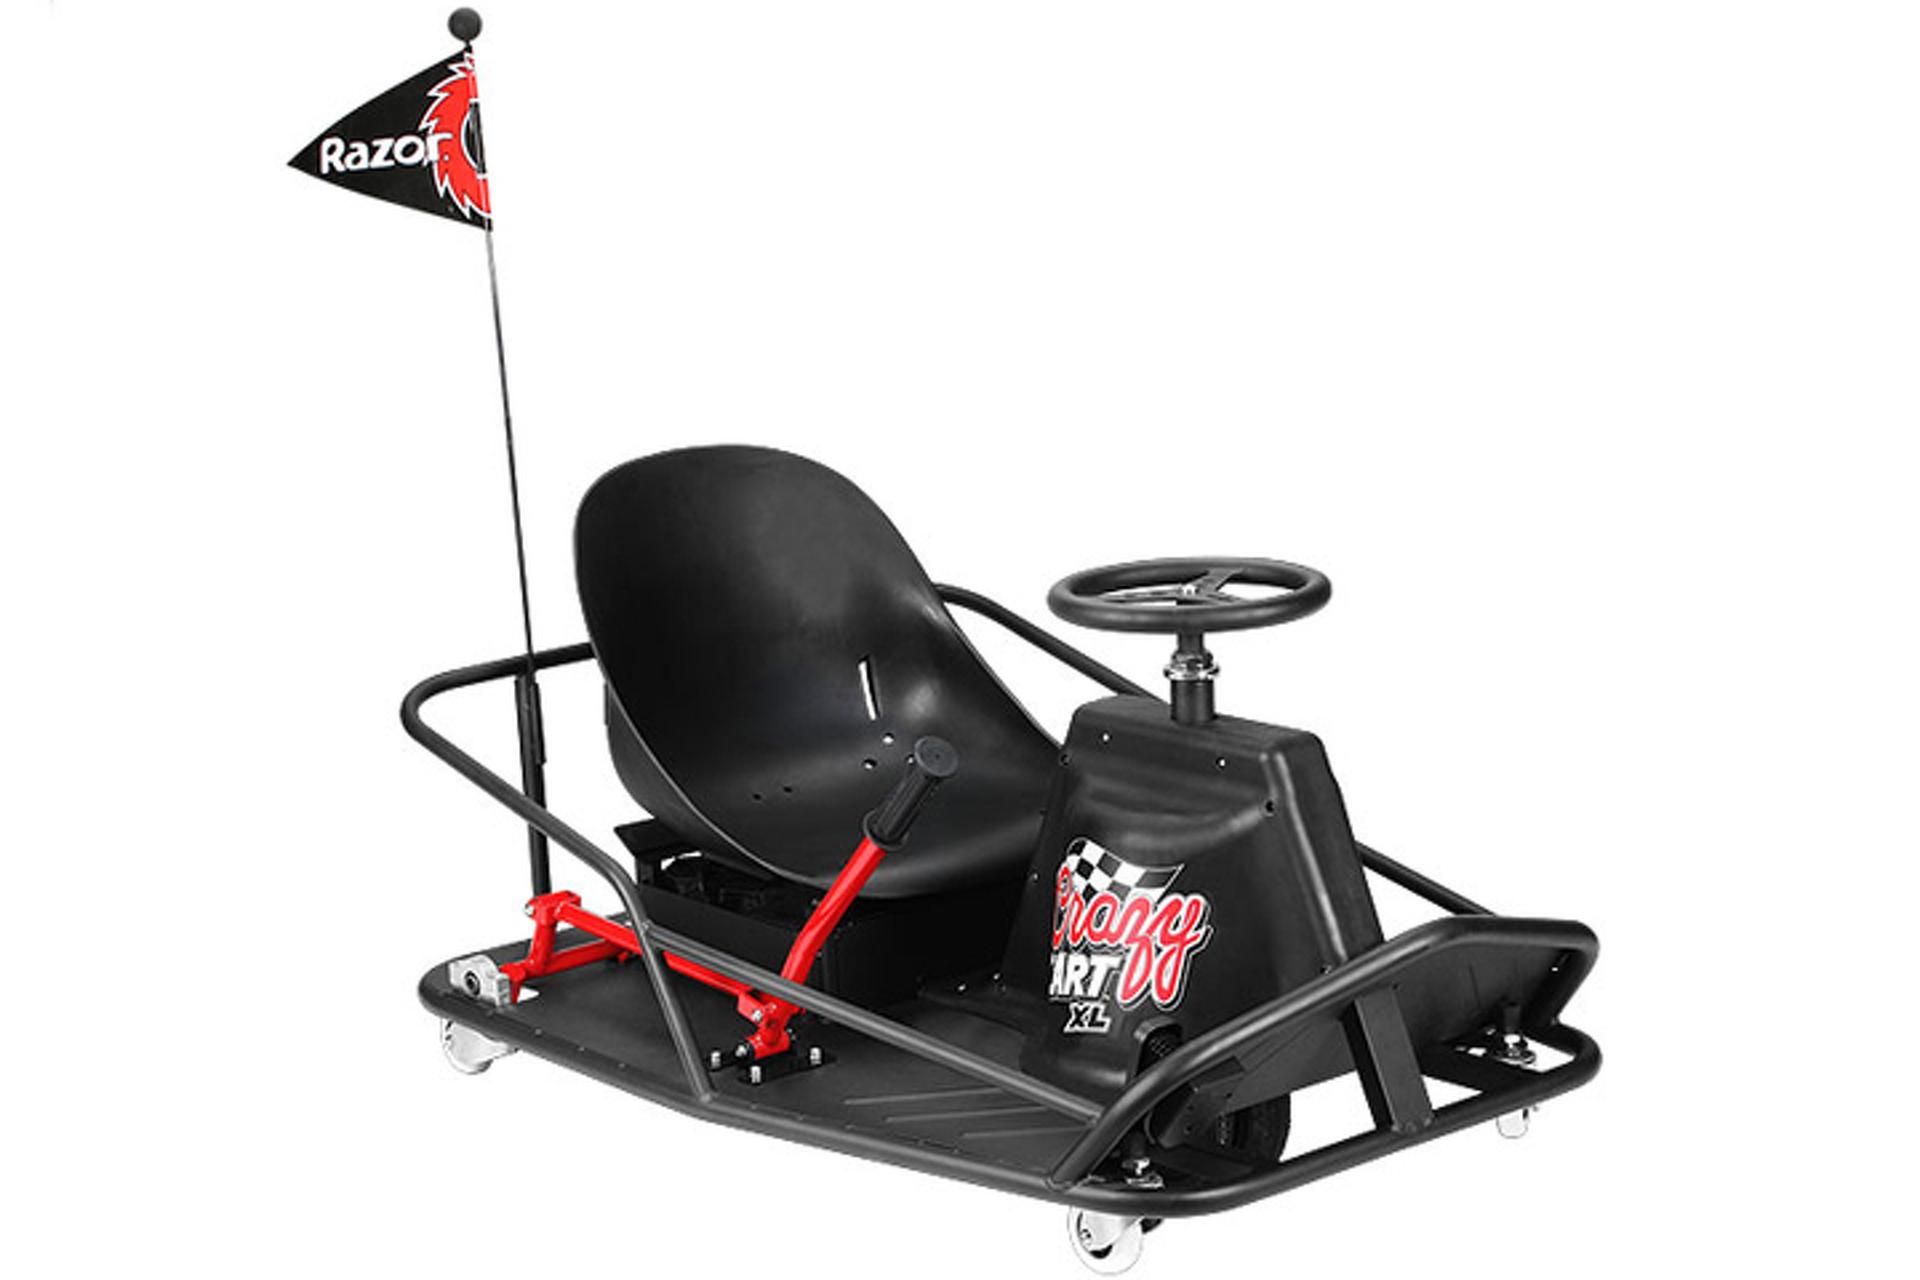 The New Razor Crazy Cart Shift Makes Drifting Easy for Kids